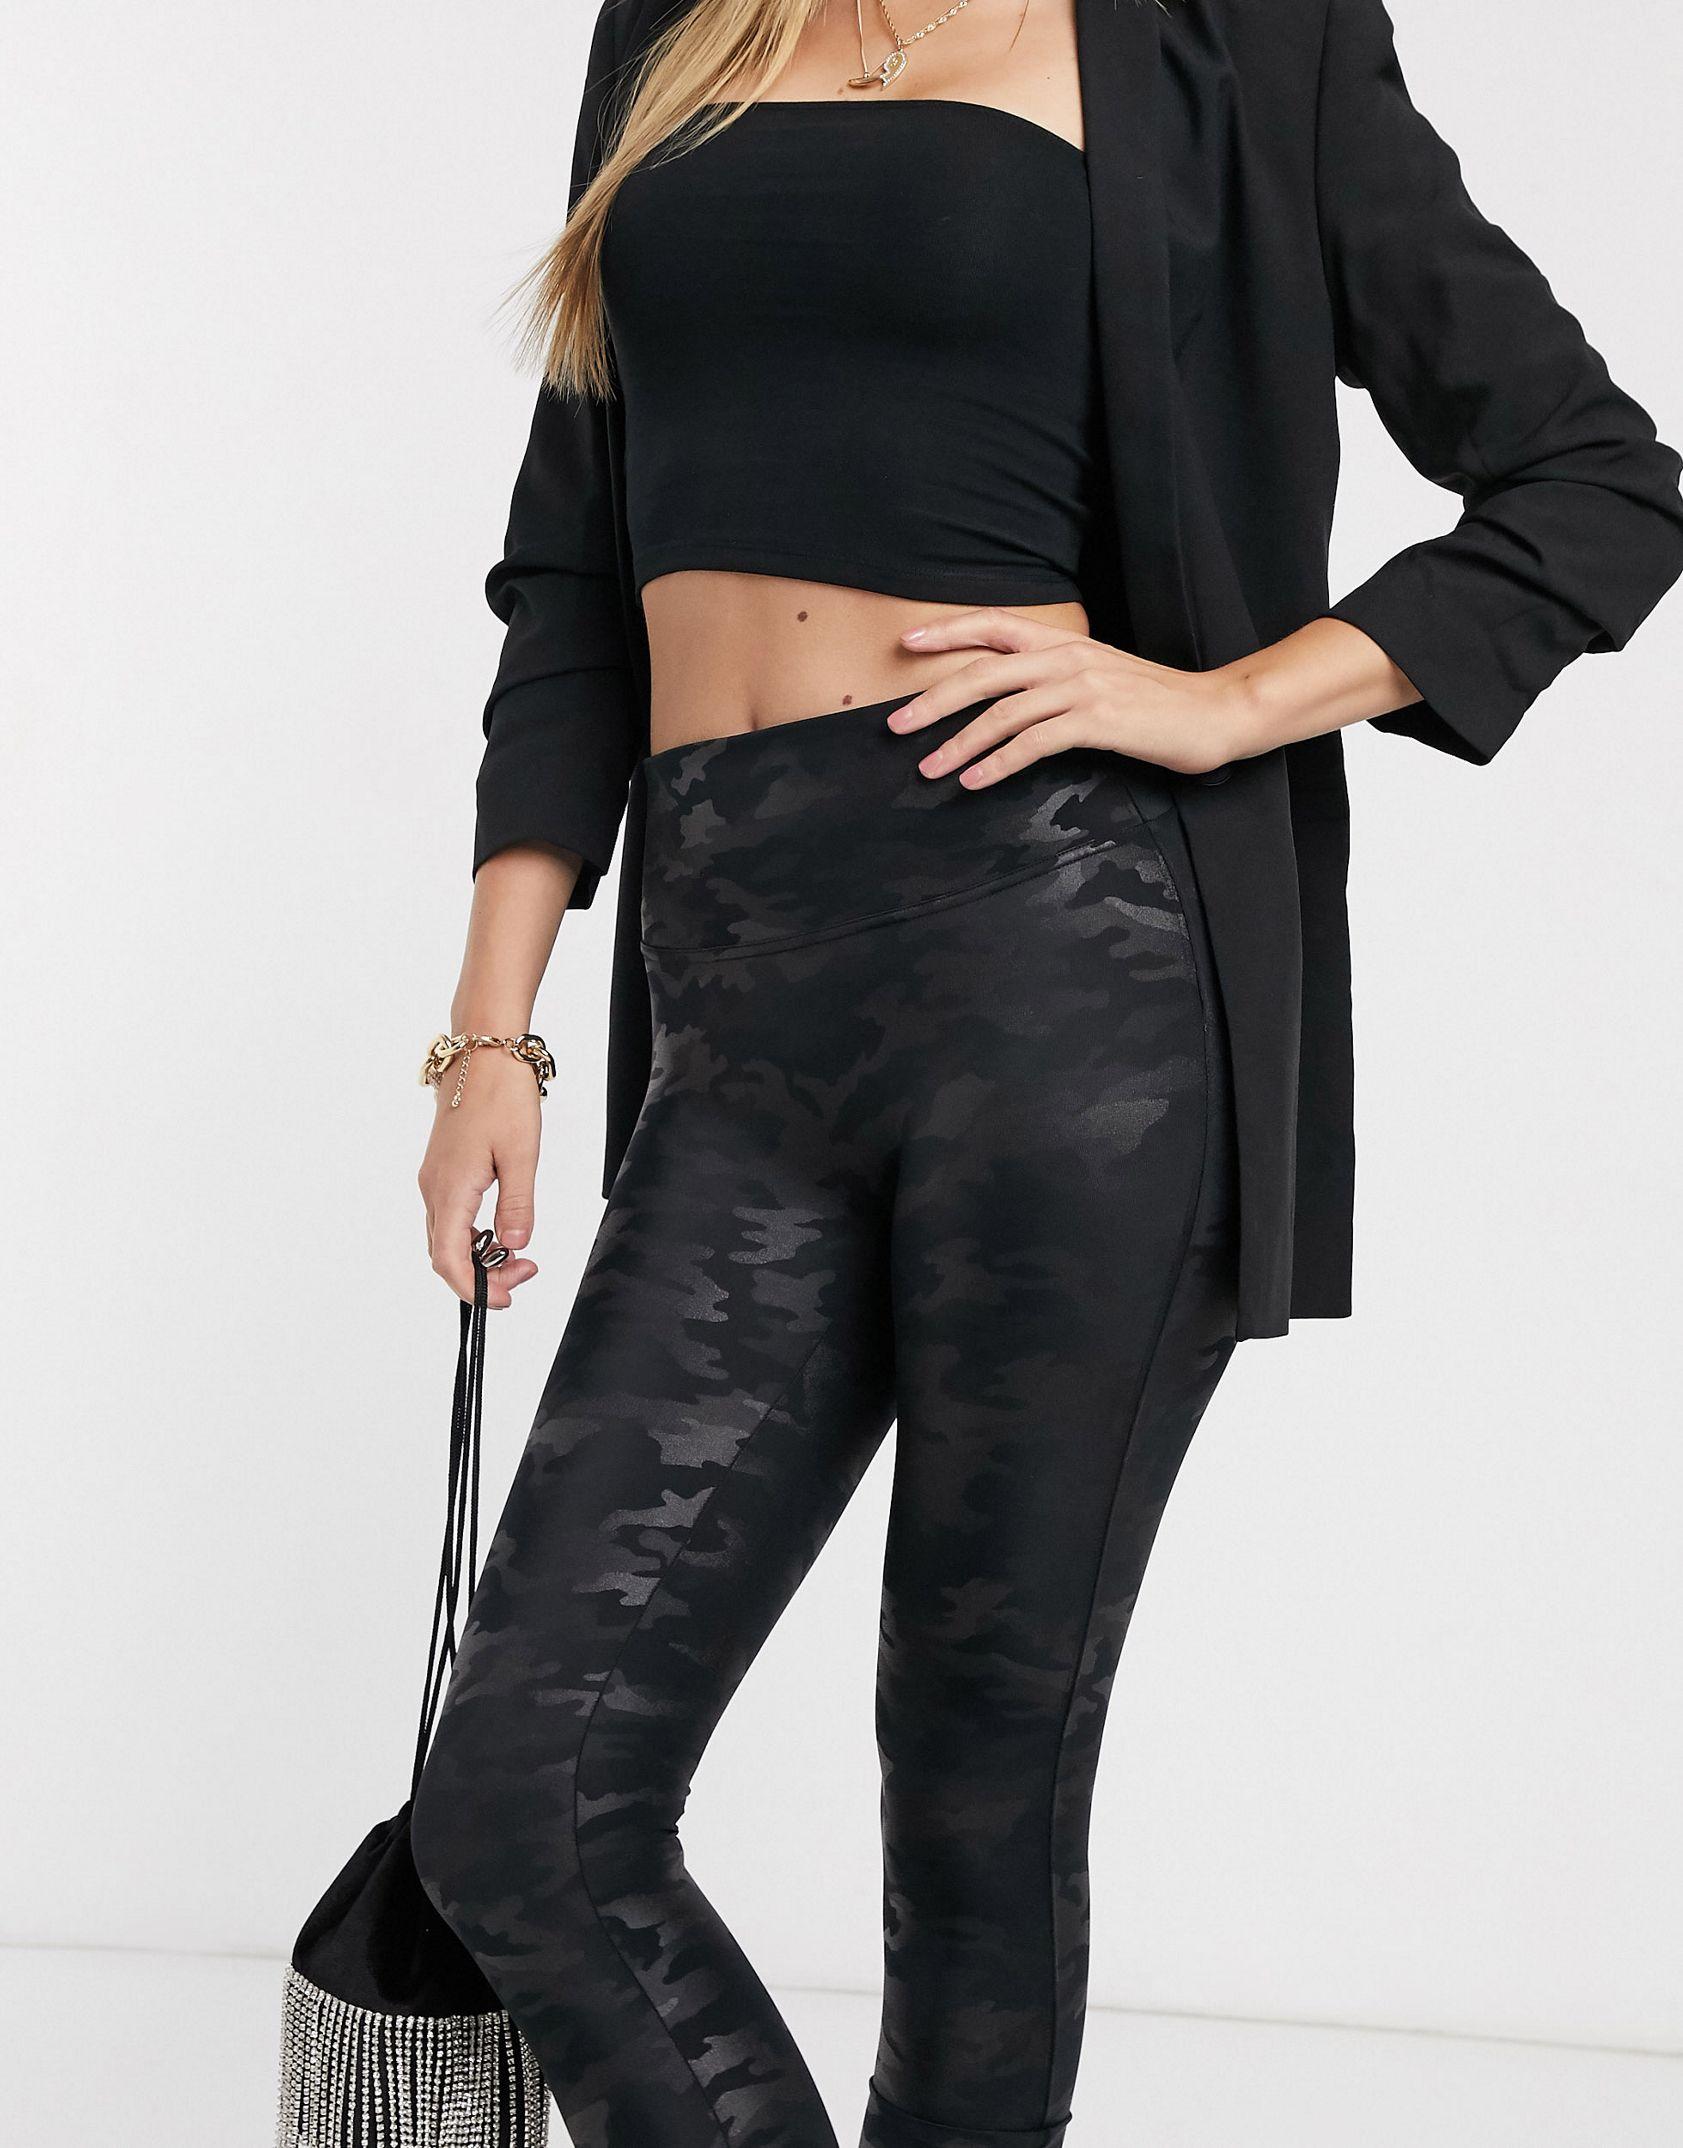 Spanx Slim Built In contoured Power Waistband tummy shaping camo legging -  Price Checker